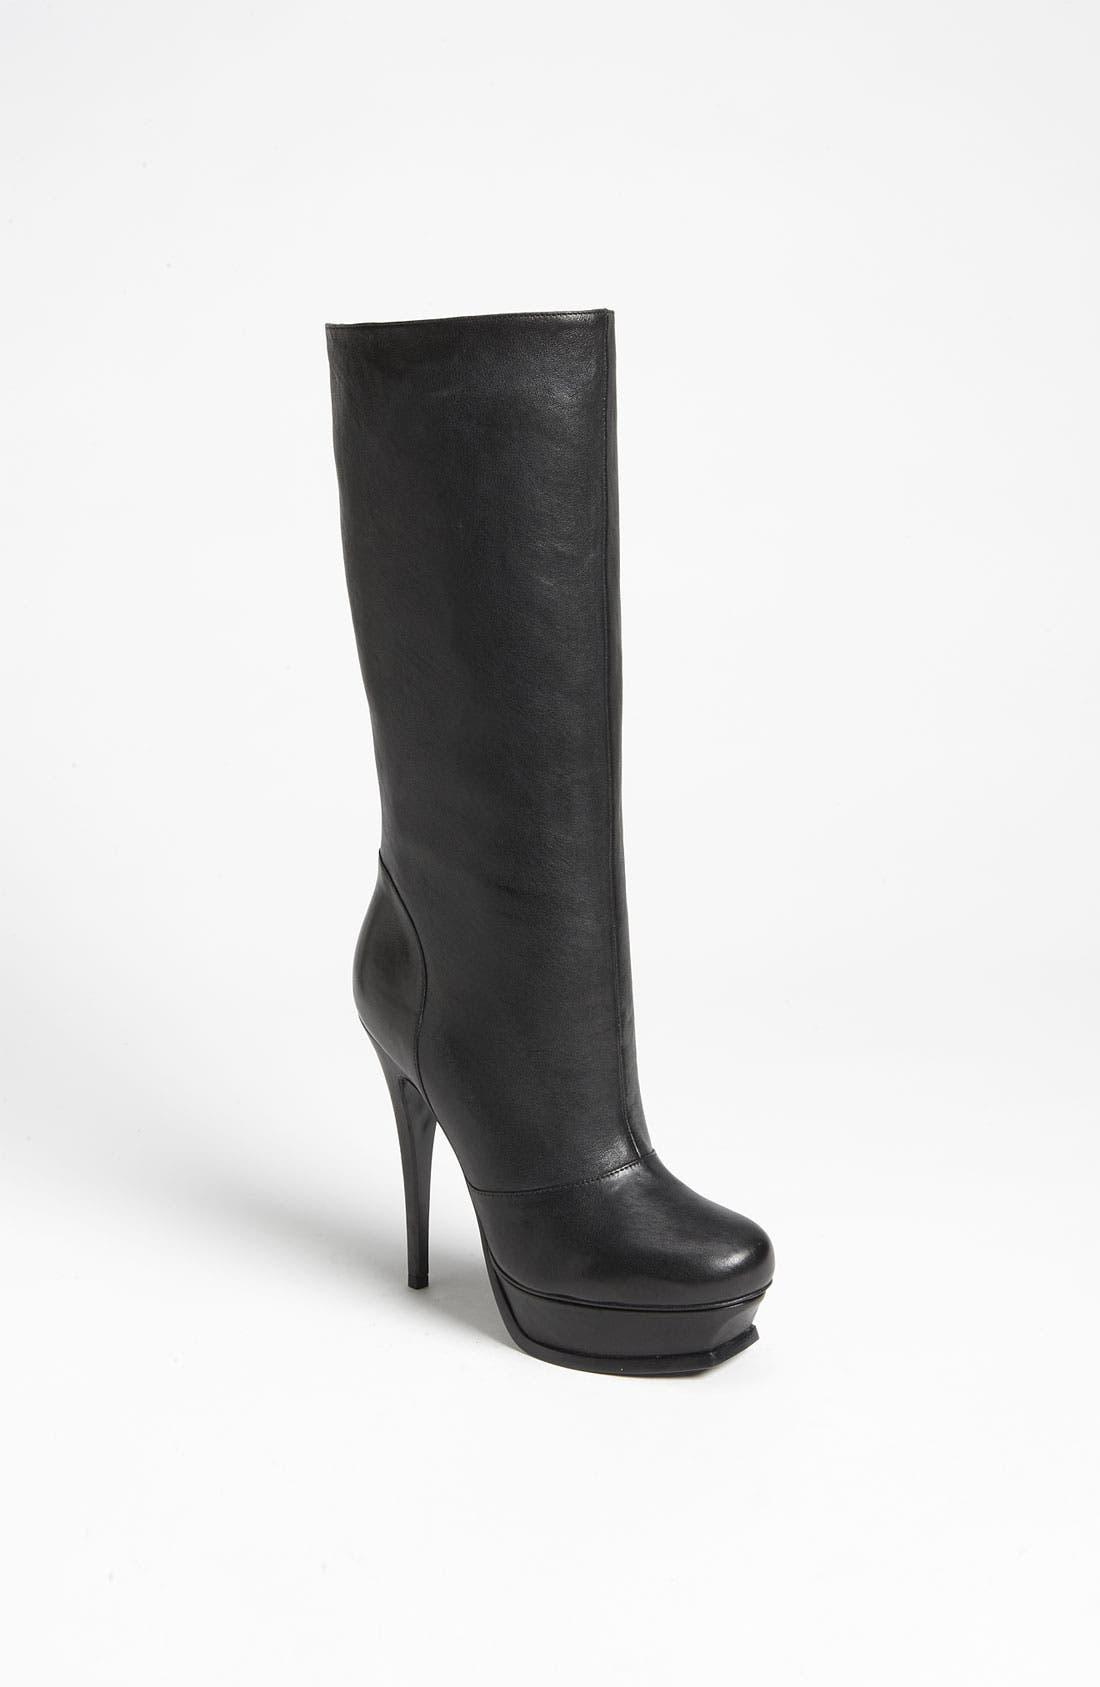 Alternate Image 1 Selected - Yves Saint Laurent 'Tribute' Boot